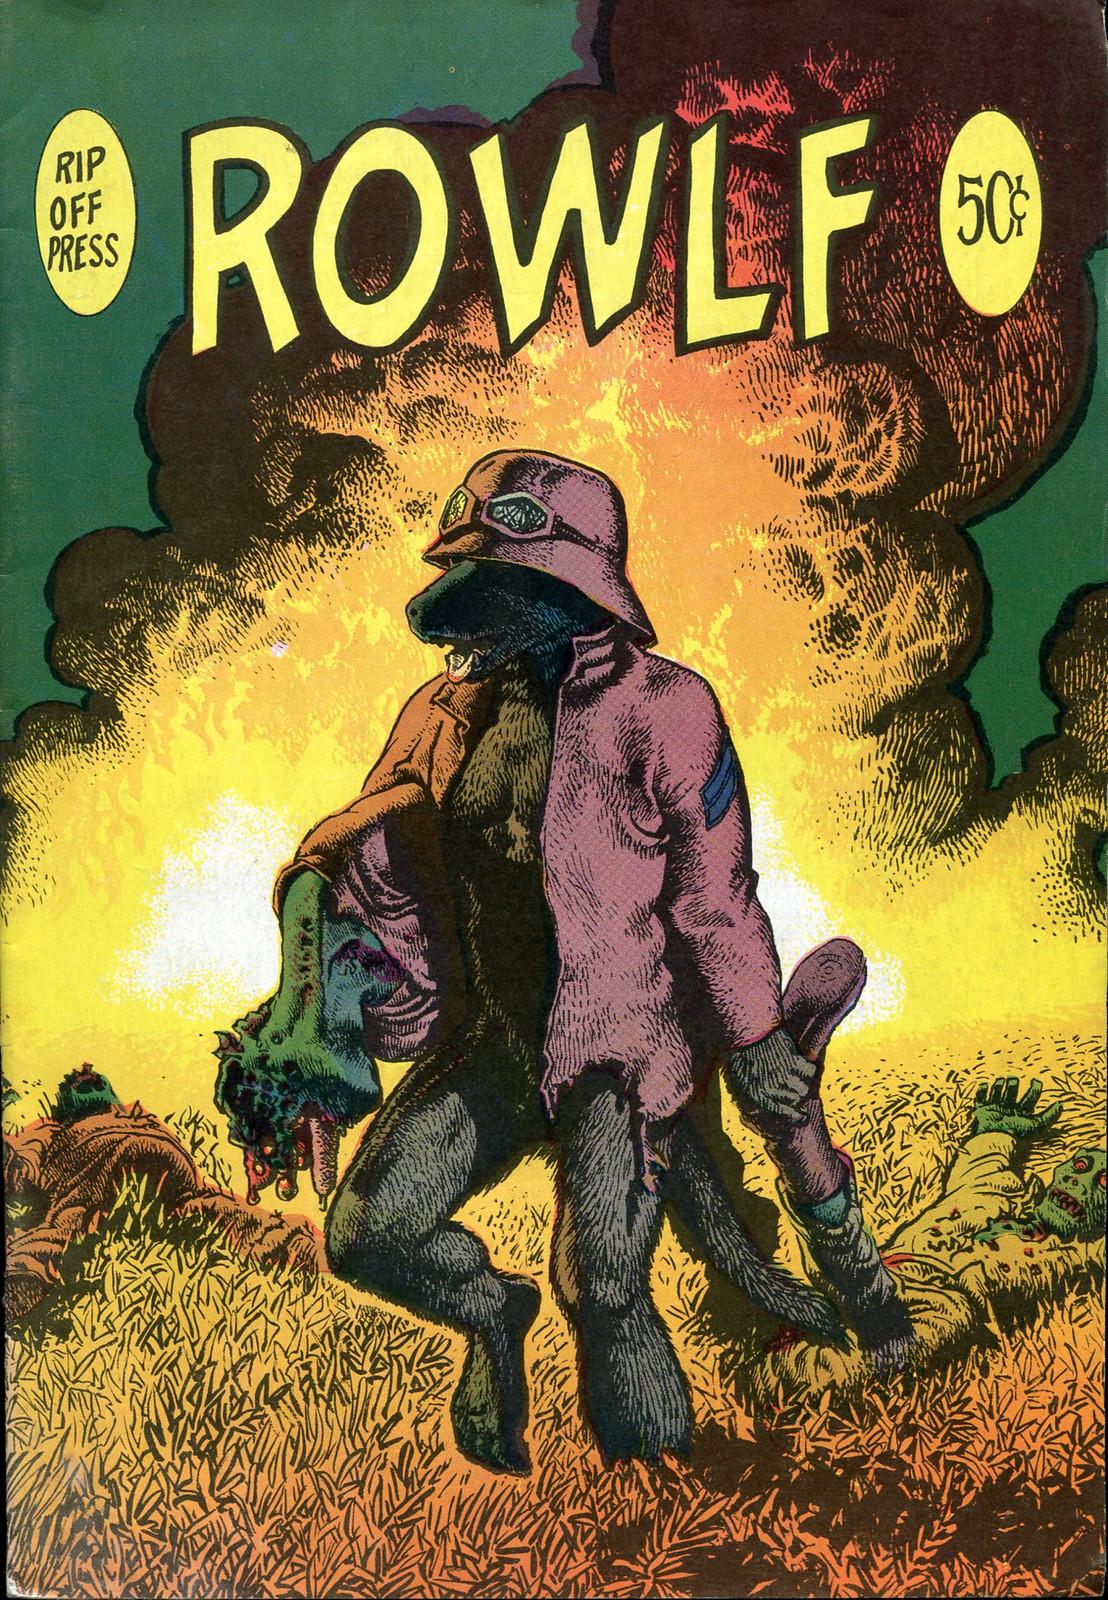 Richard Corben -  Rowlf (Rip Off Press, 1971)